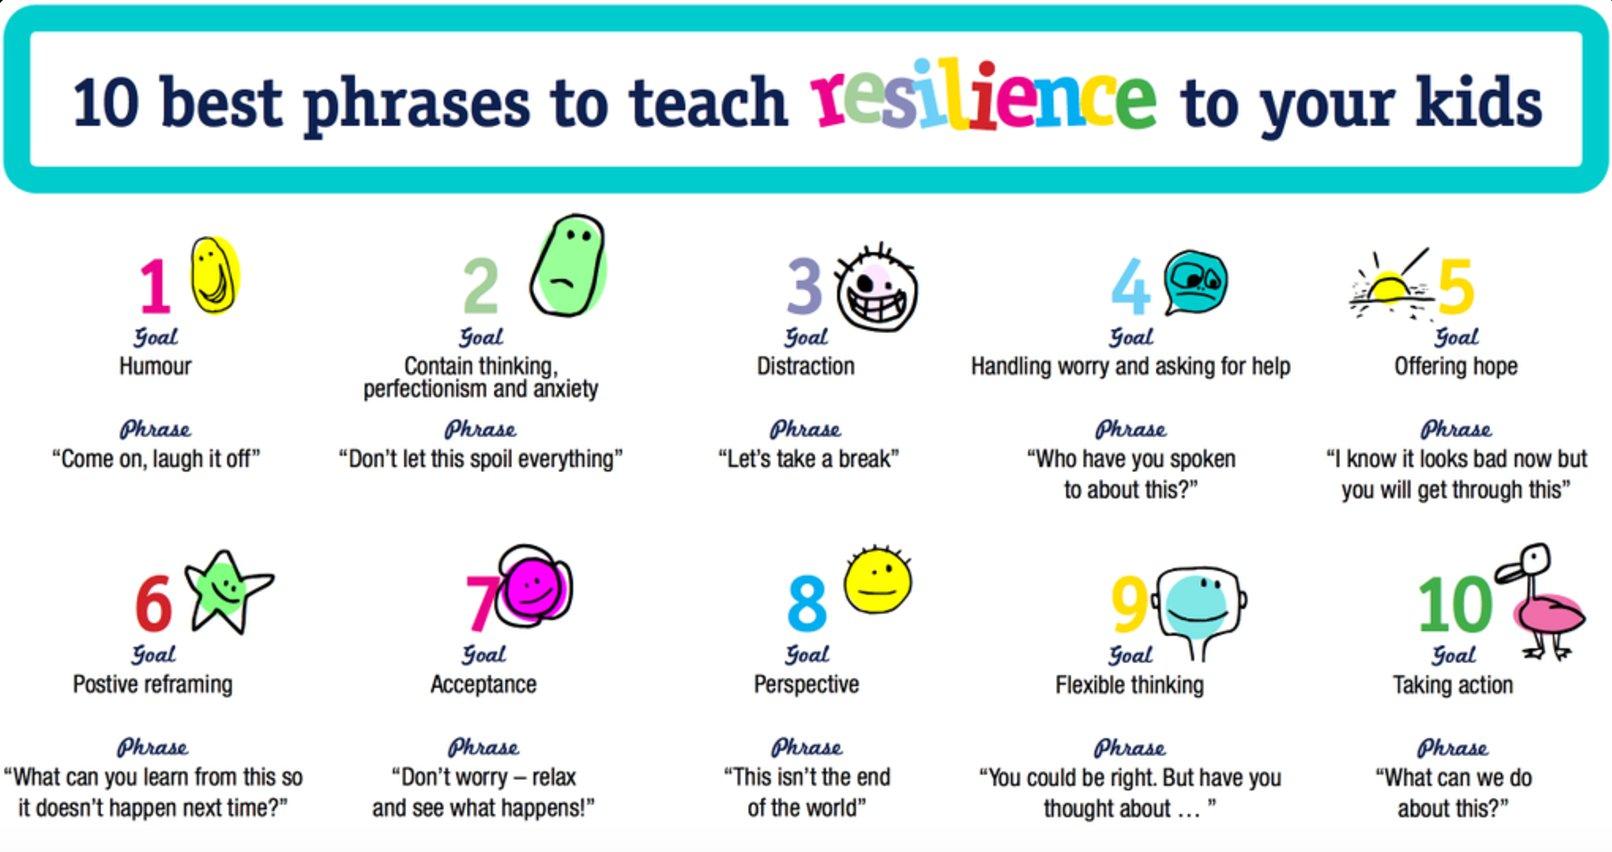 The 10 best phrases to teach resilience to your kids: via @KidspotSocial #edchat #education https://t.co/BqyLL37tg1